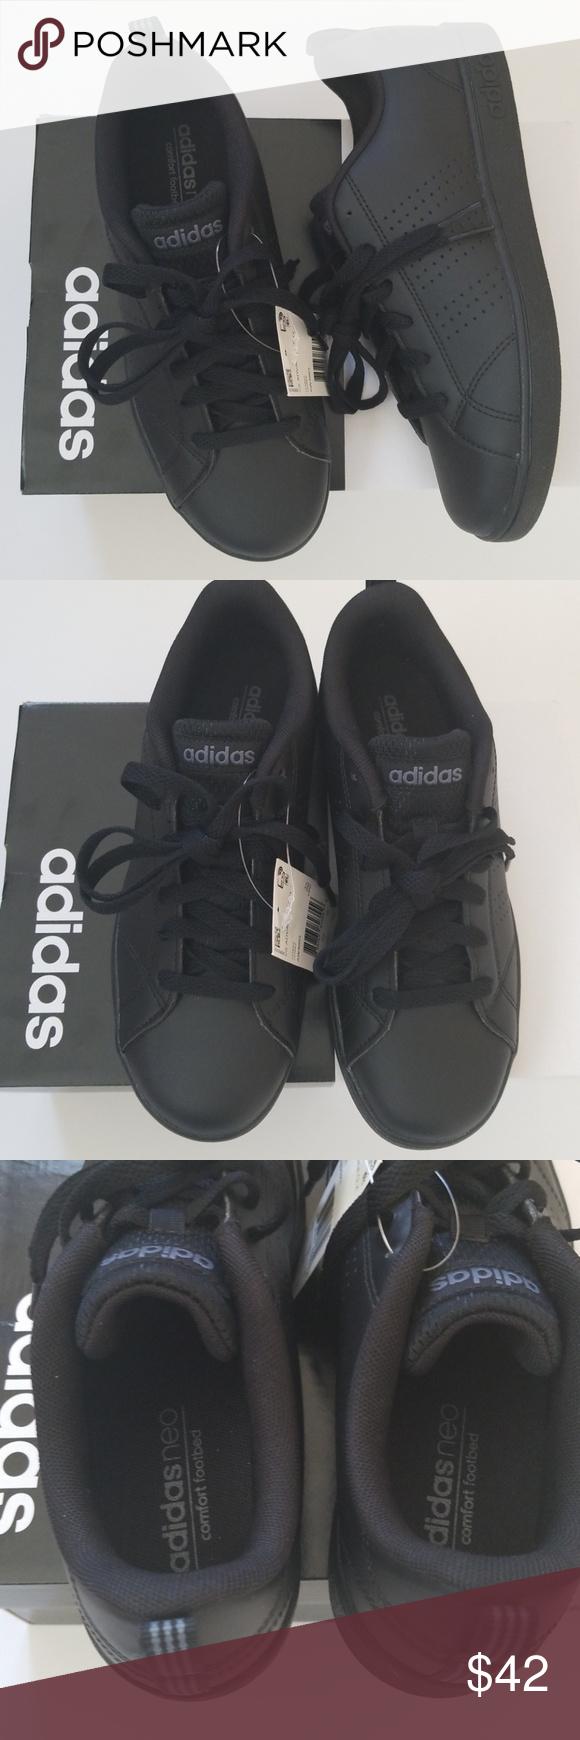 boys black adidas school shoes